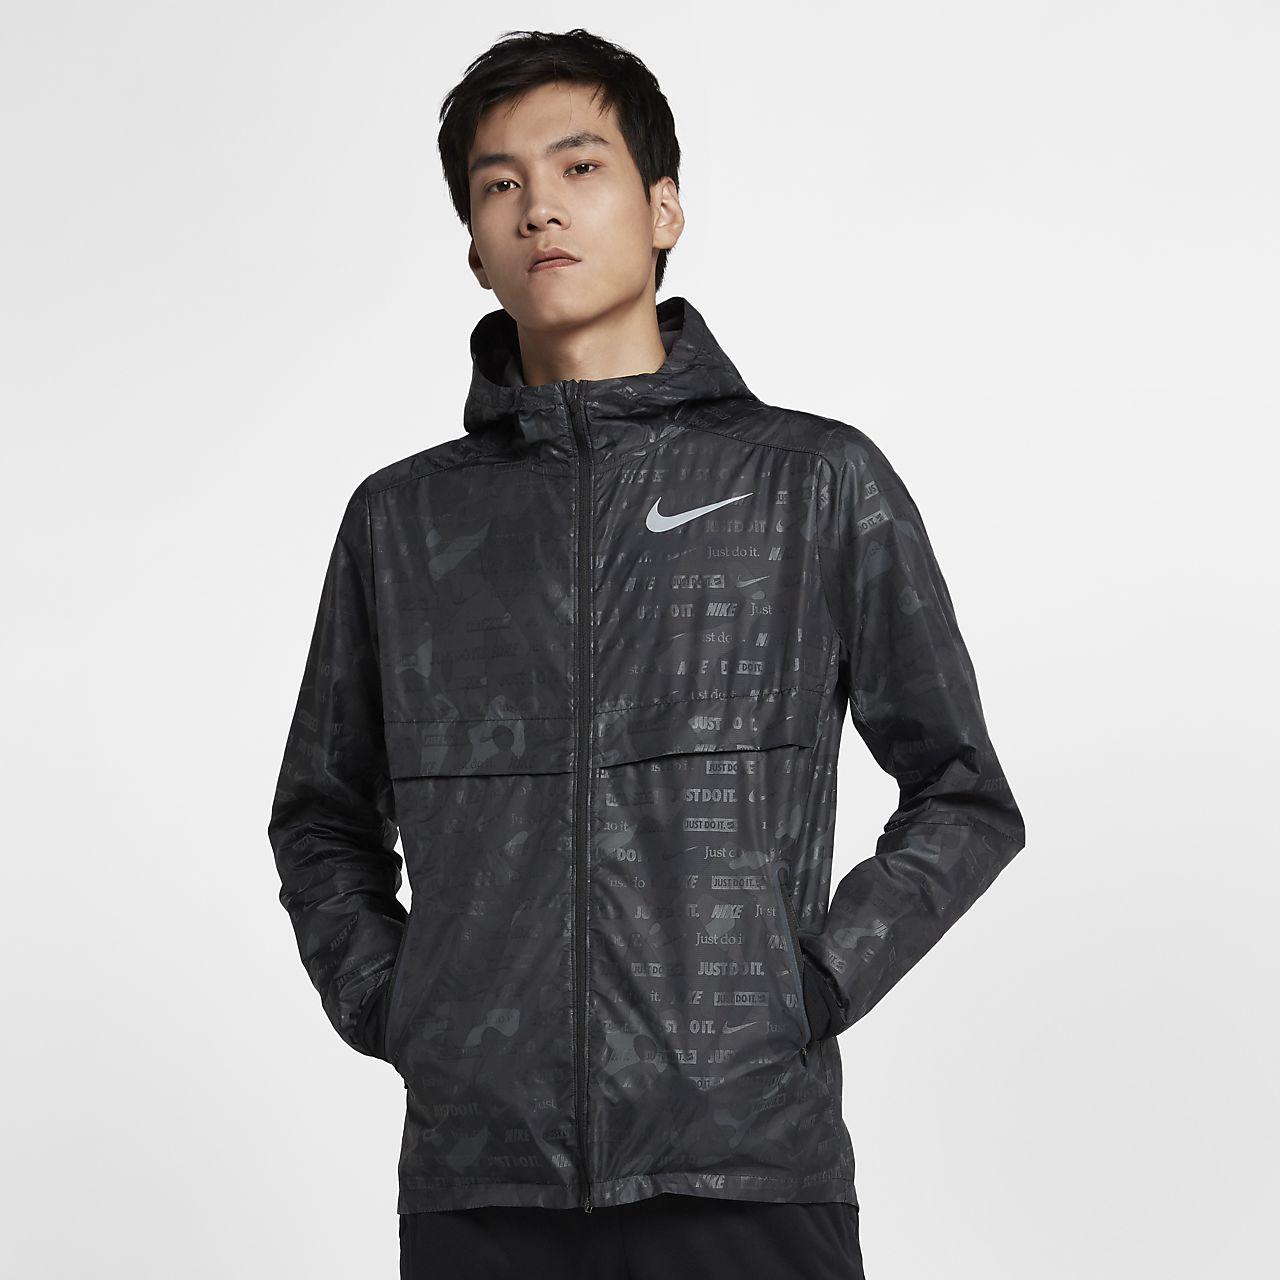 ea4c91ac3b4a Nike Shield Ghost Flash Men s Running Jacket. Nike.com CA